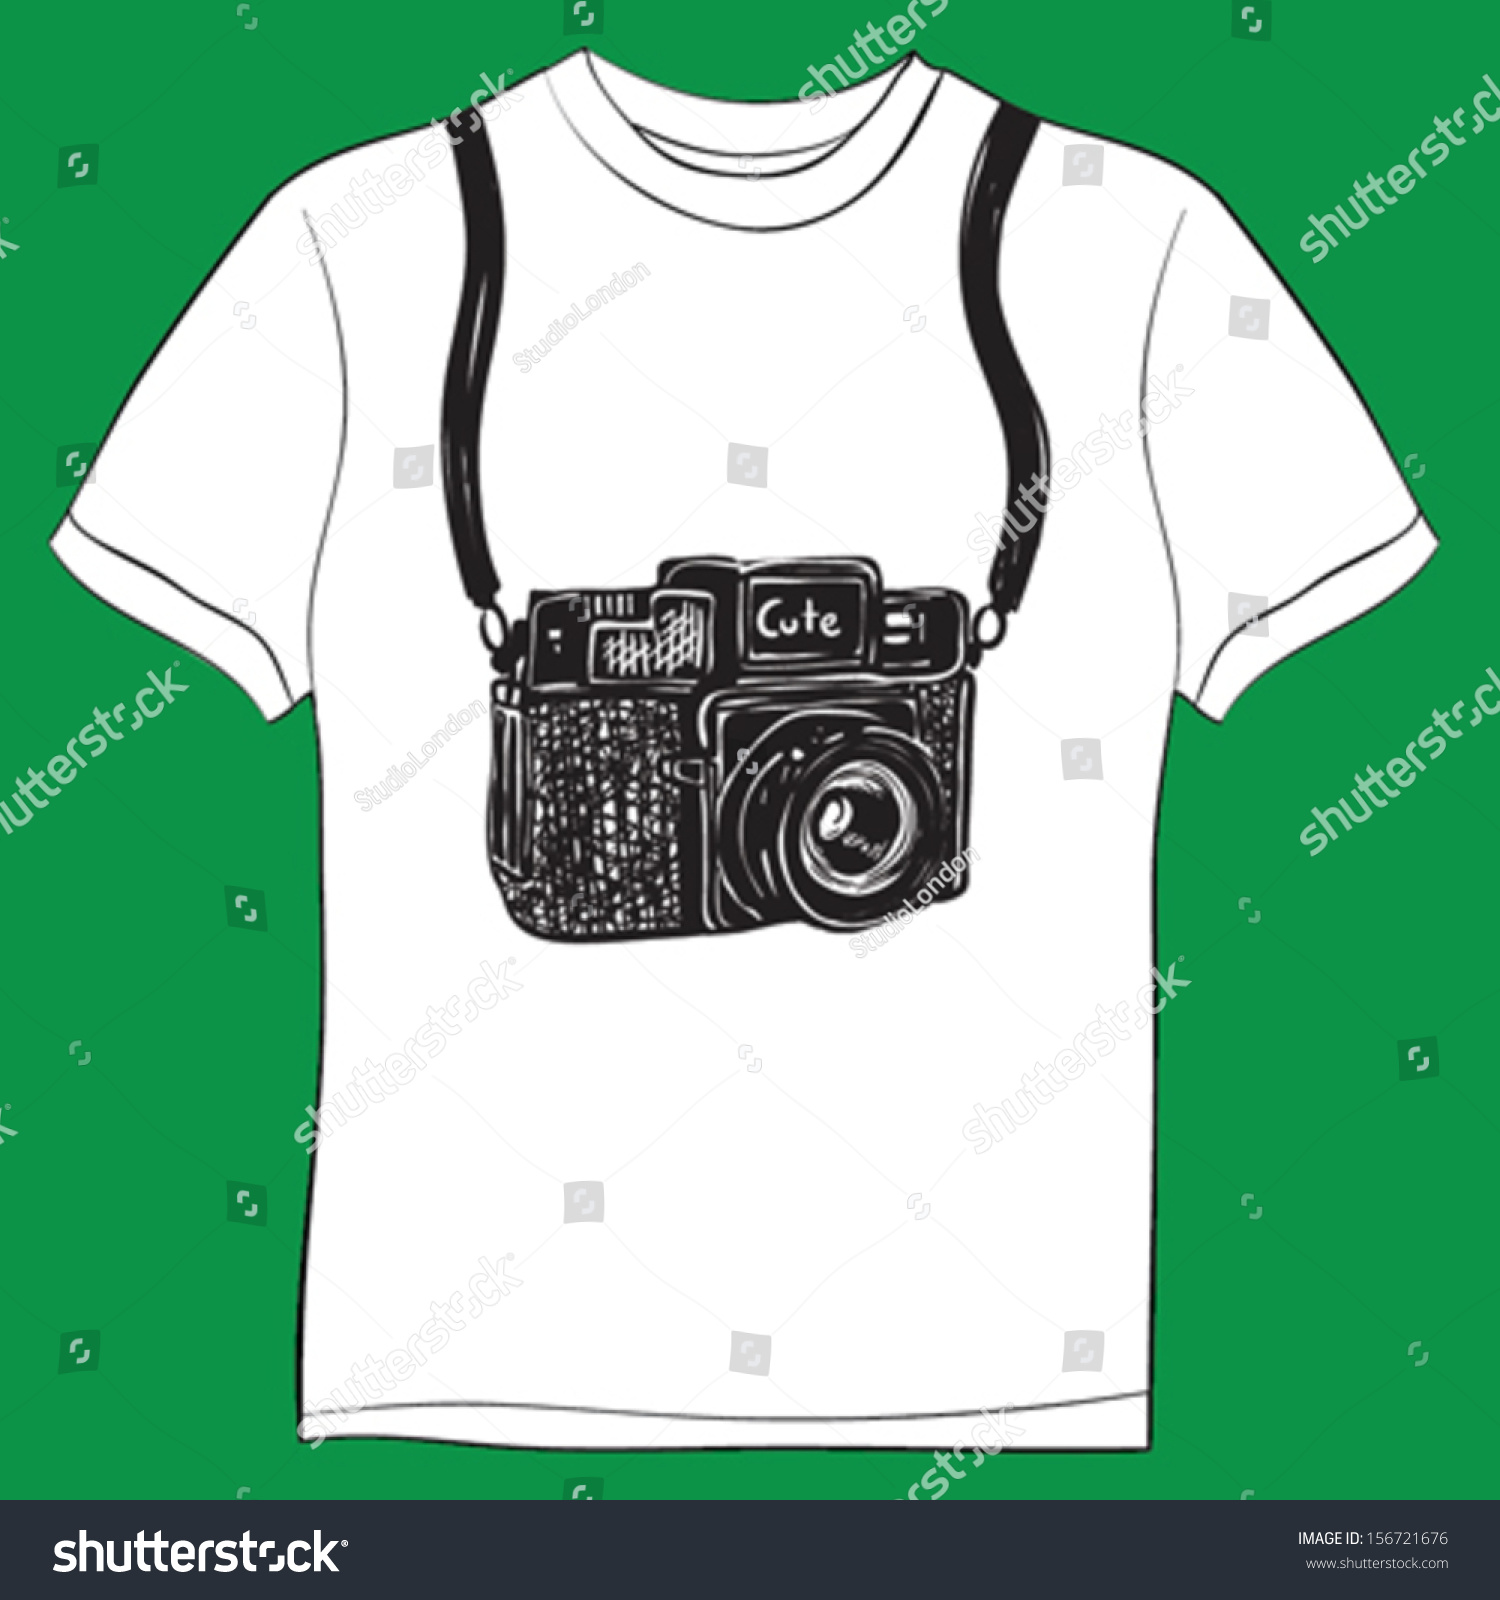 Shirt design book - Camera T Shirt Graphics Cute Cartoon Characters Cute Graphics For Kids